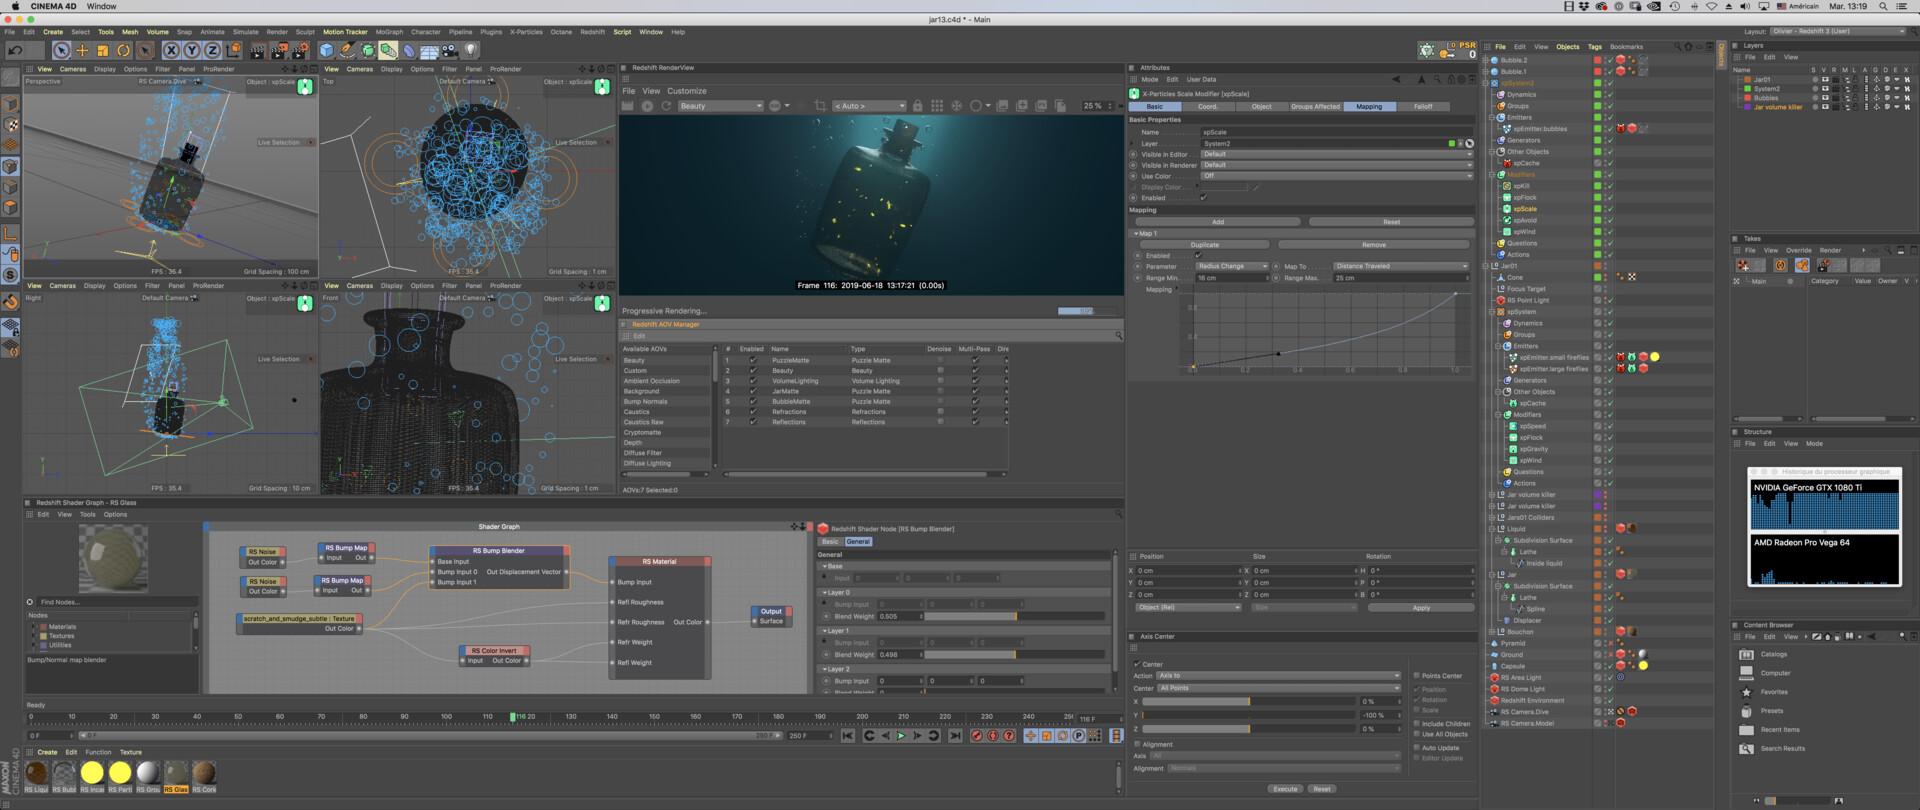 Screen capture - Using Nvidia GTX 1080 TI  on an iMac Pro!